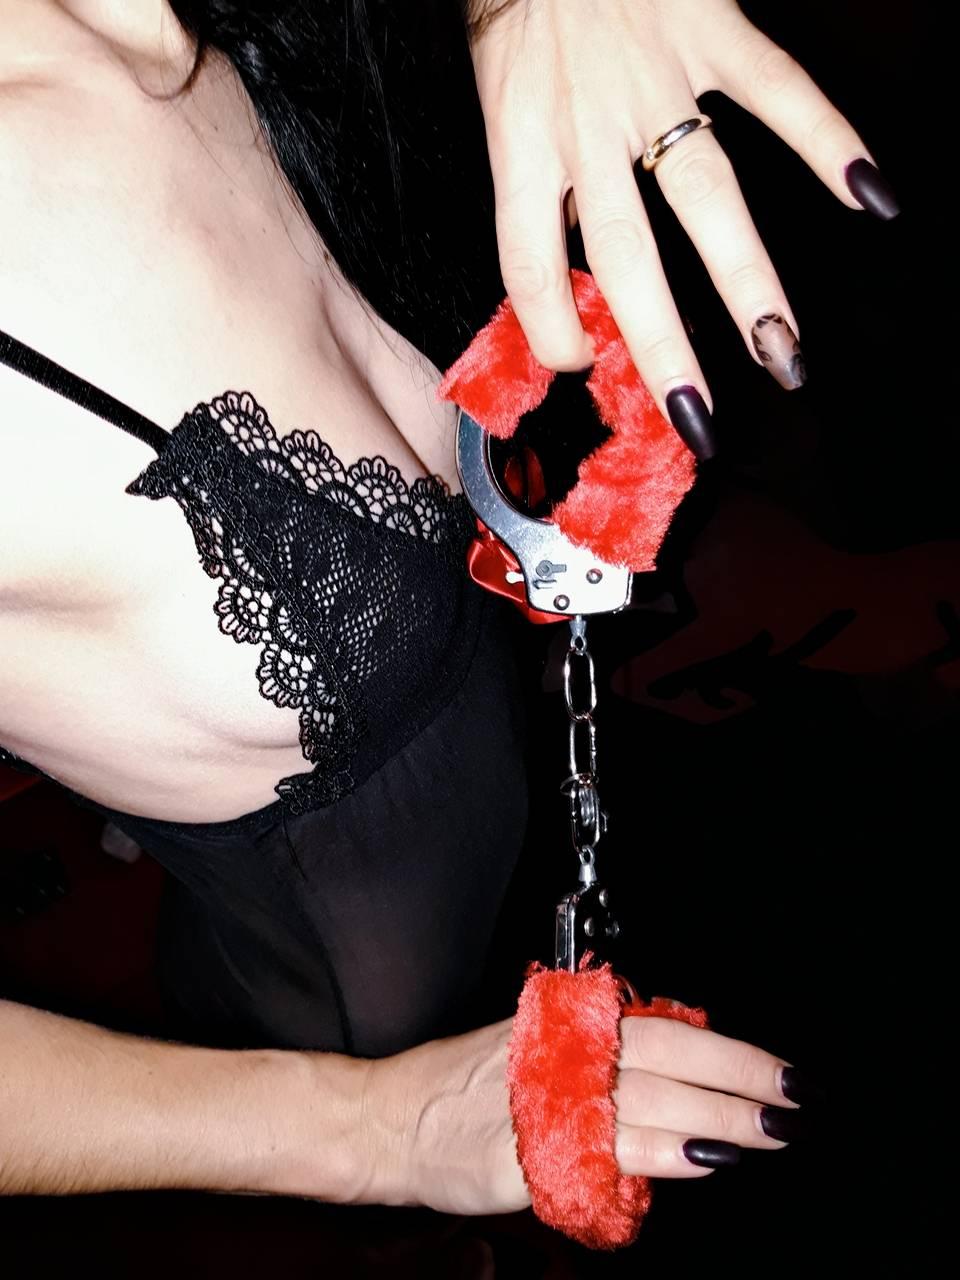 Kinky Έφη